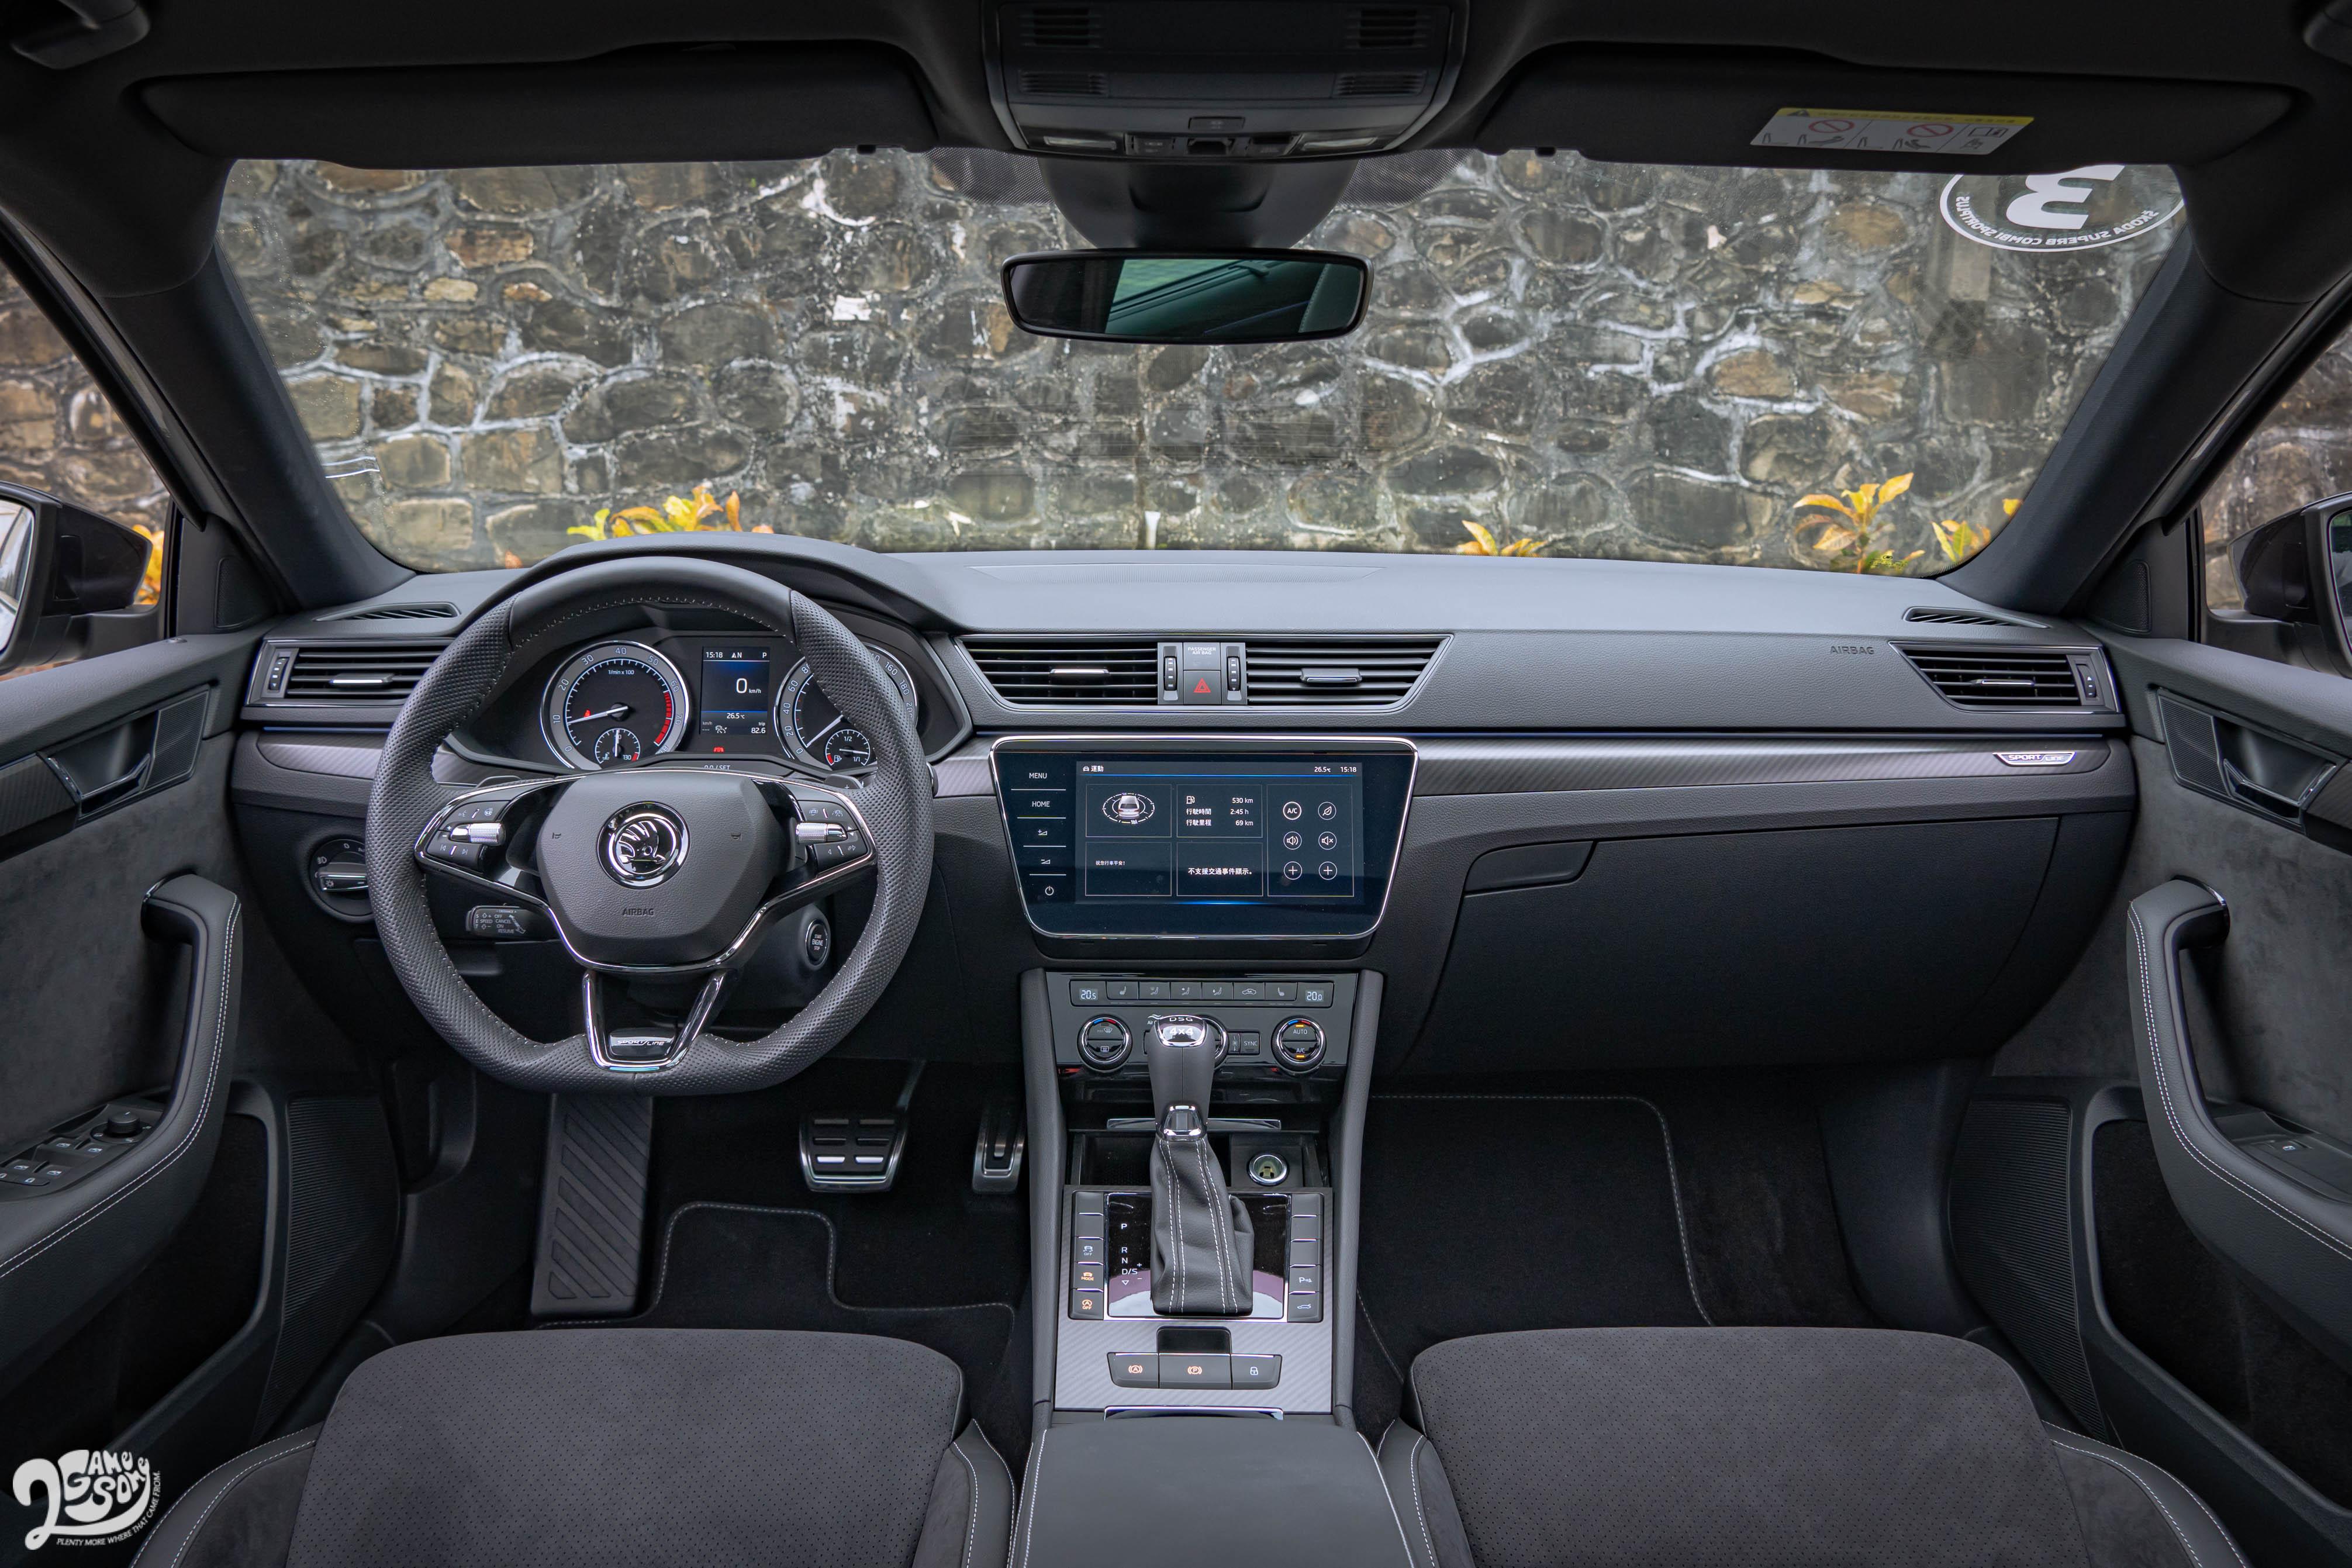 Sportline 以上車型配備黑色飾板以及黑色Alcantara真皮座椅。